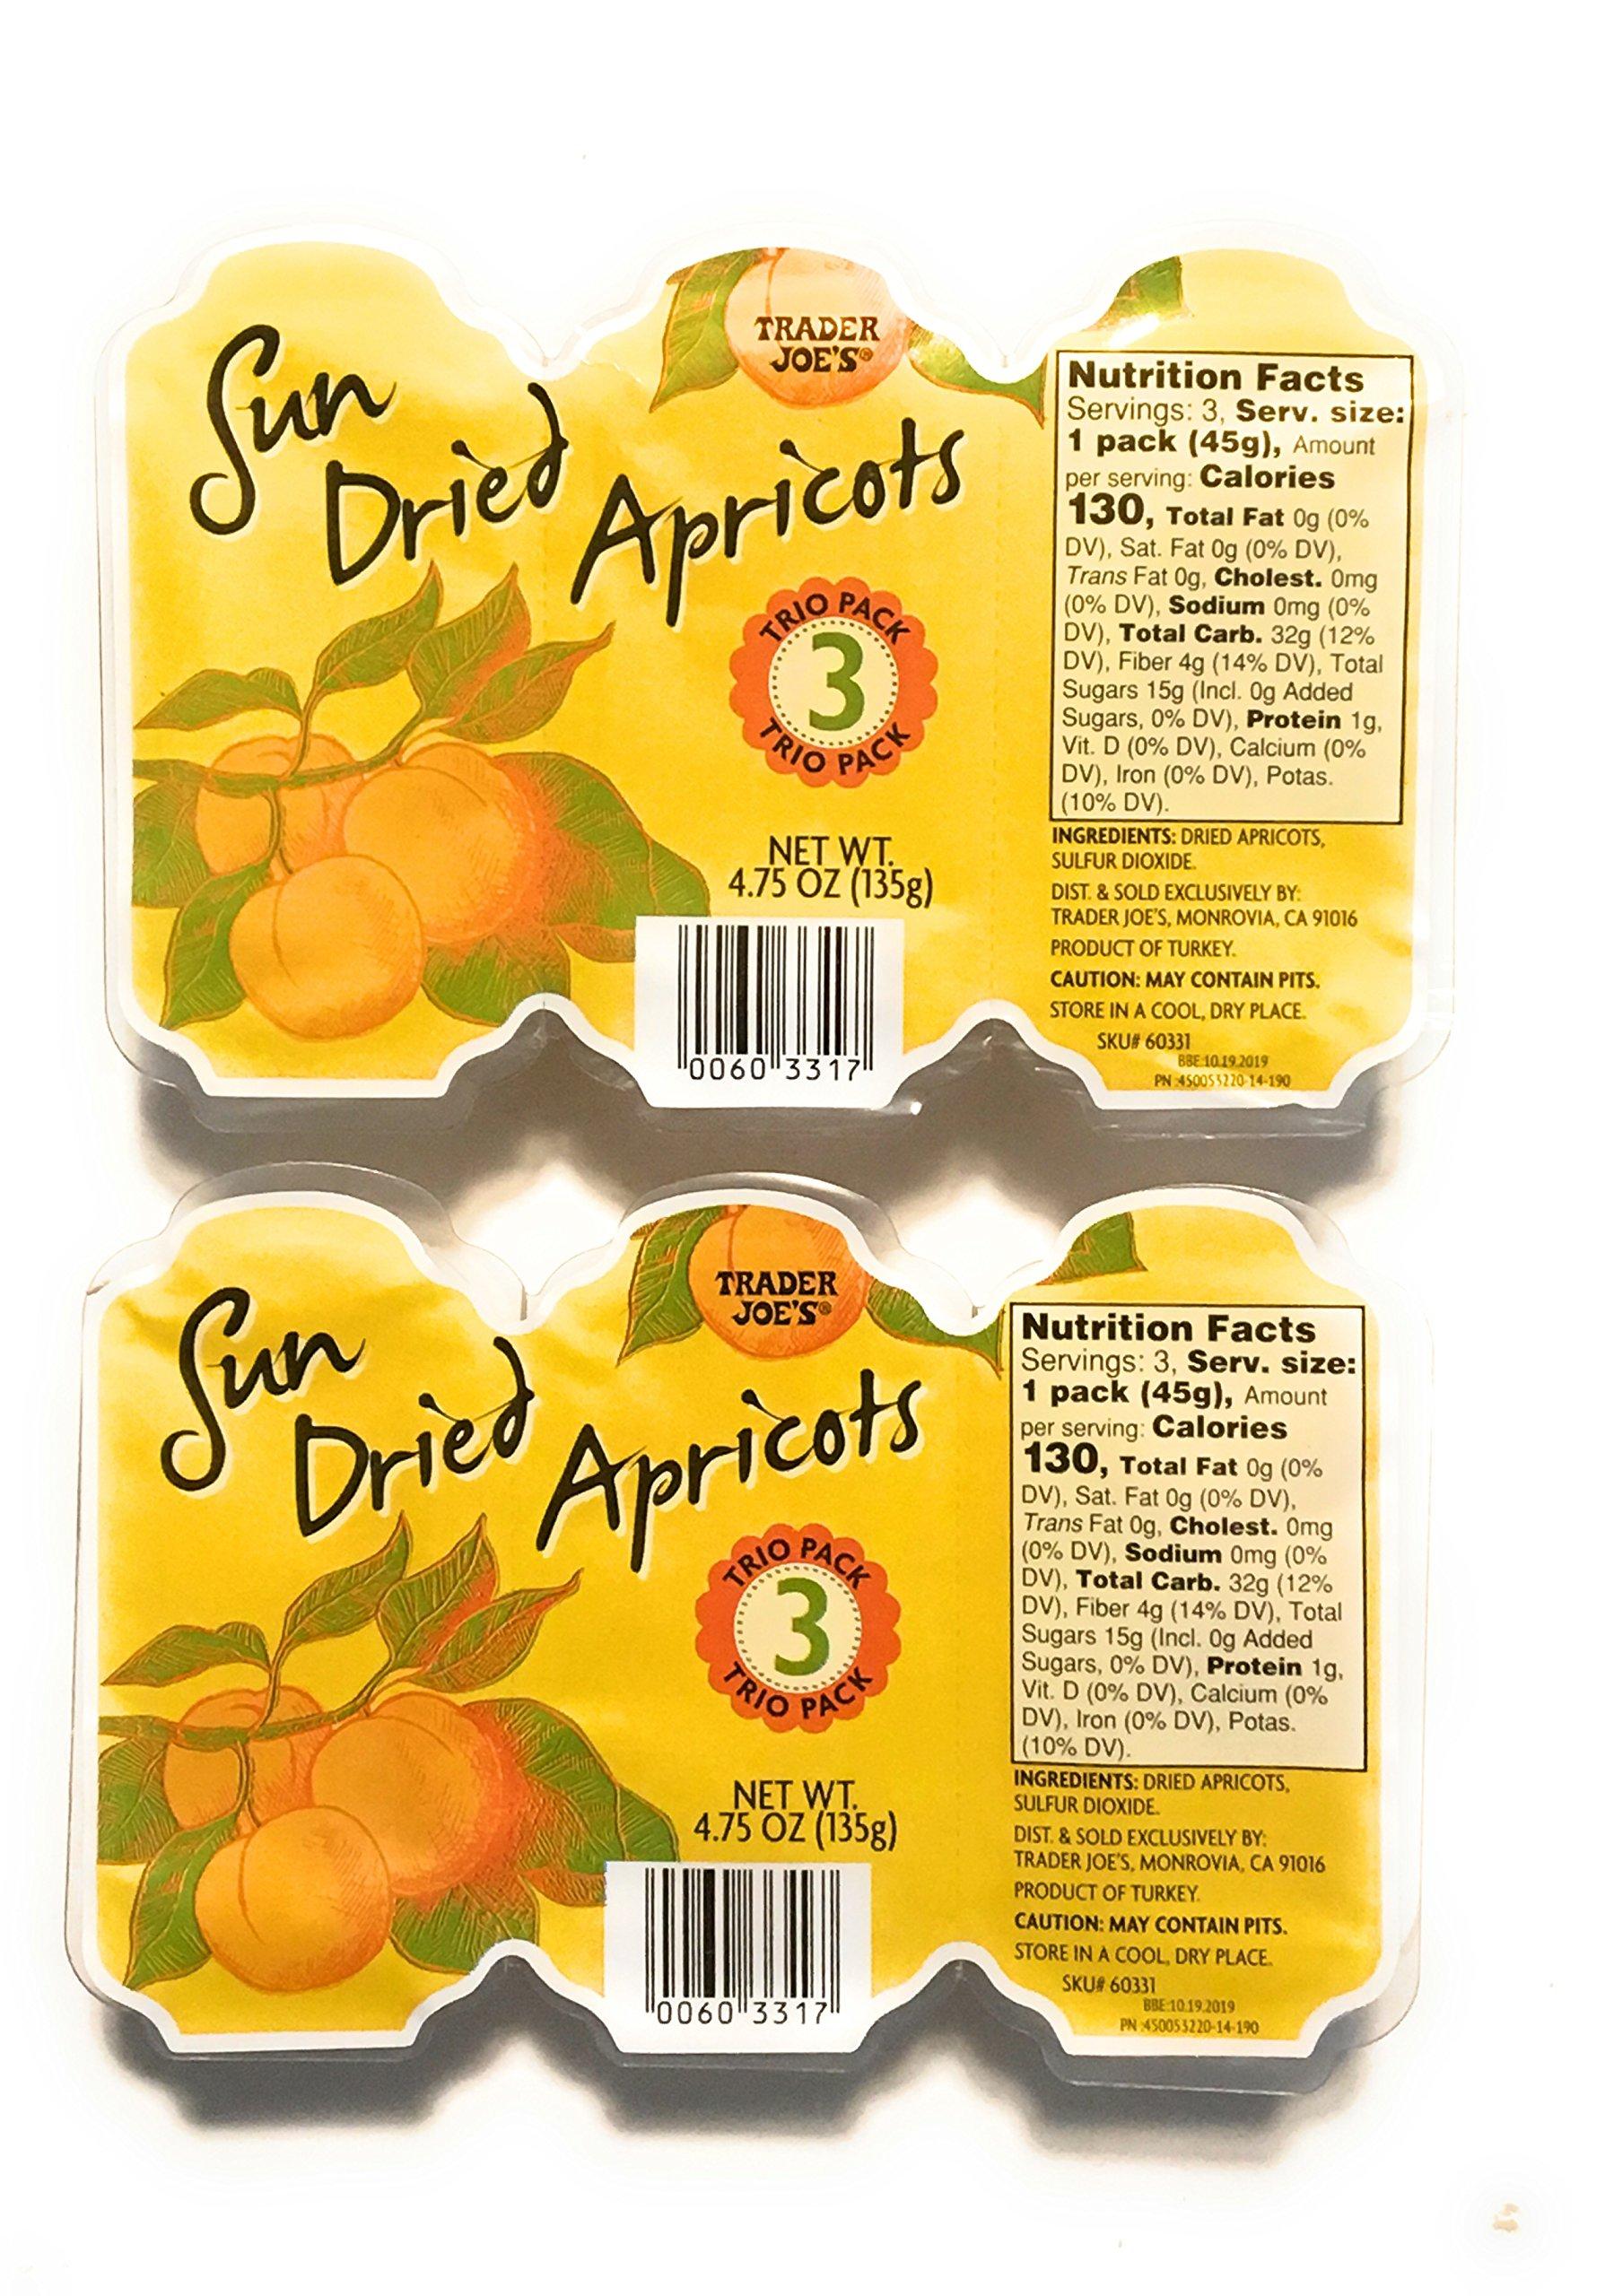 Trader Joe's Sun dried Apricots 2 pack